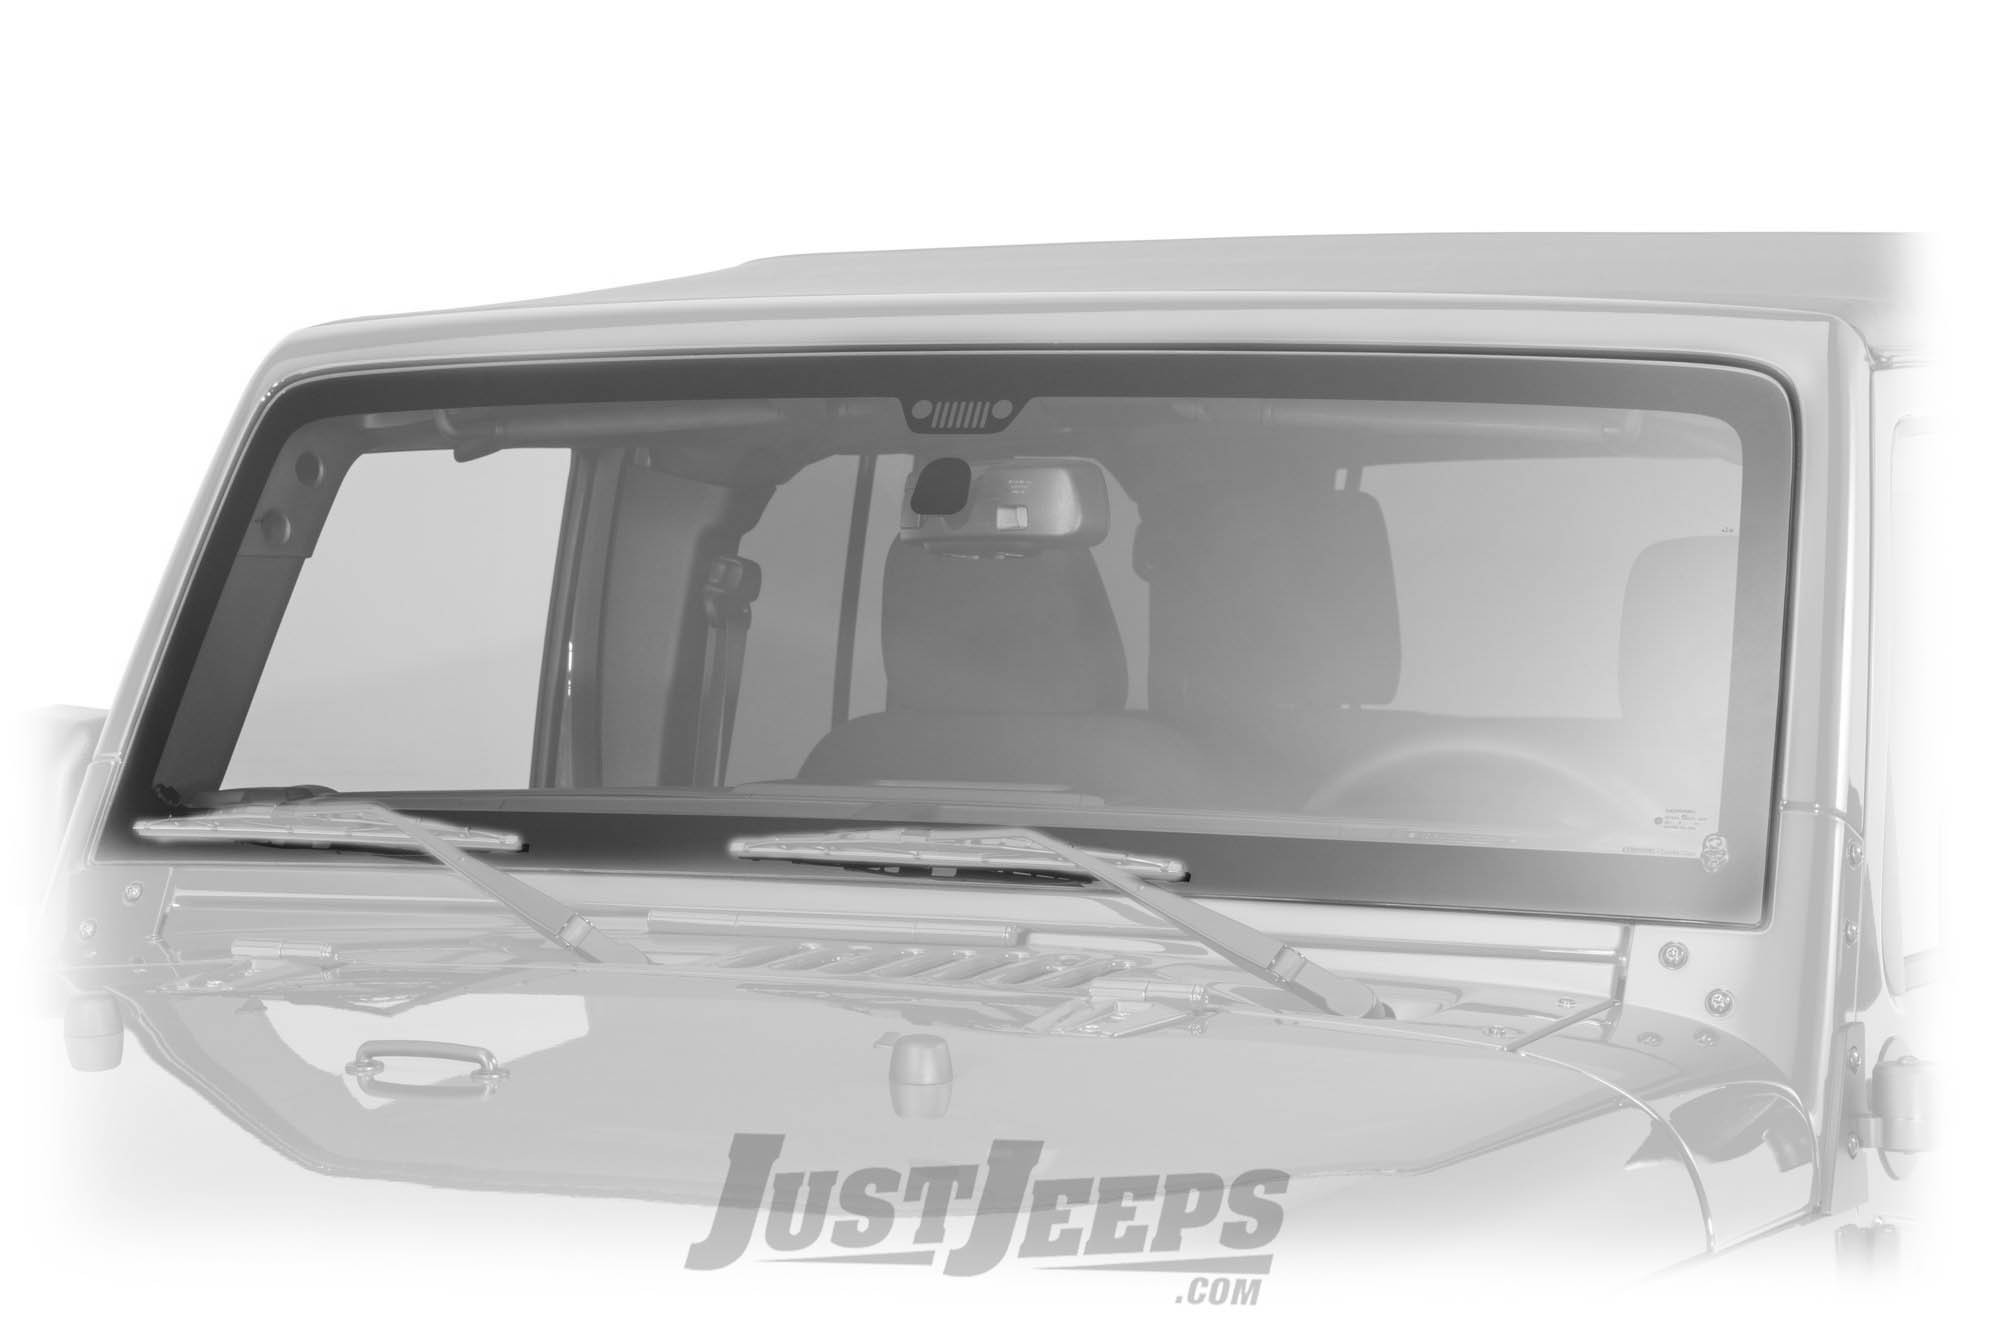 Just Jeeps Mopar Gorilla Glass For 2007 18 Jeep Wrangler